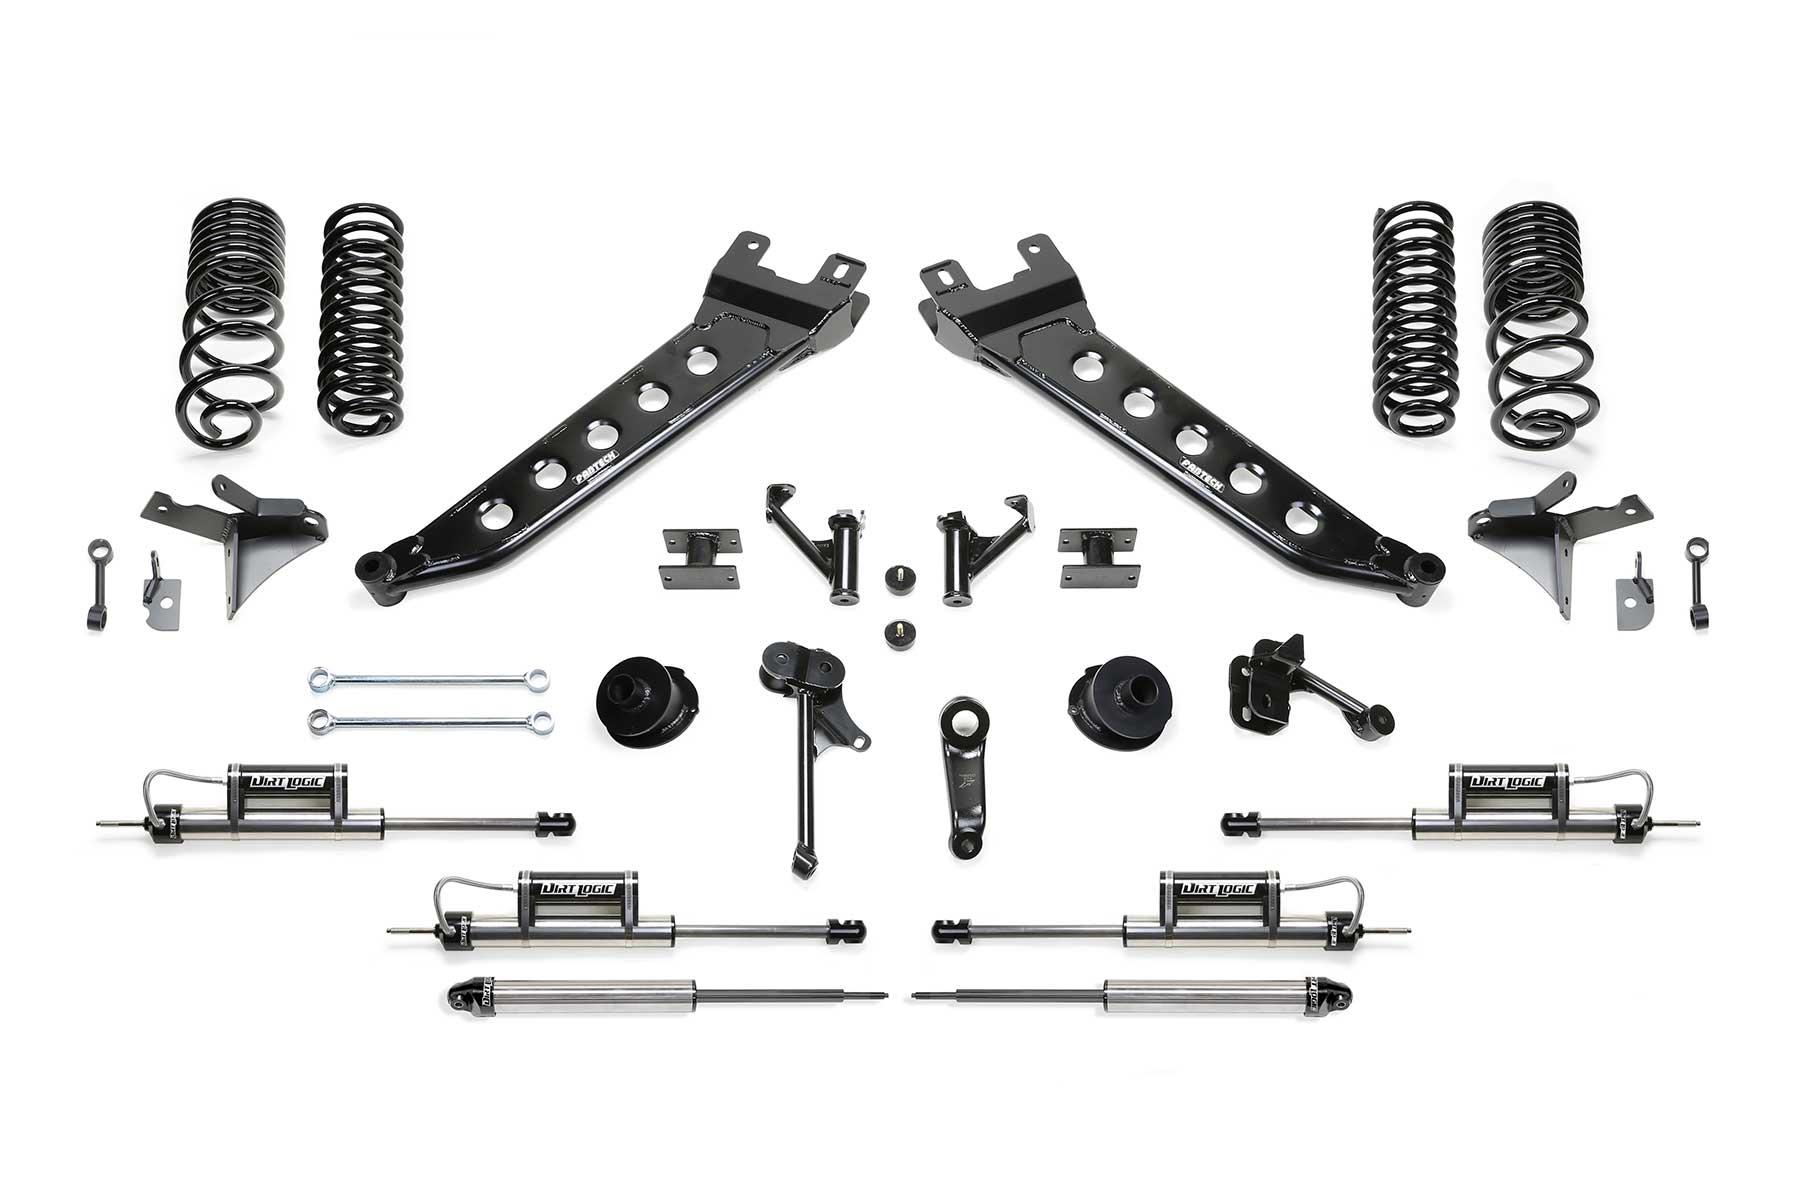 "5"" Radius Arm System w/Coil Springs & Front Dual Dirt Logic 2.25 Resi  Shocks & Rear Dirt Logic 2.25 Shocks - K3165DL | Fabtech Motorsports"